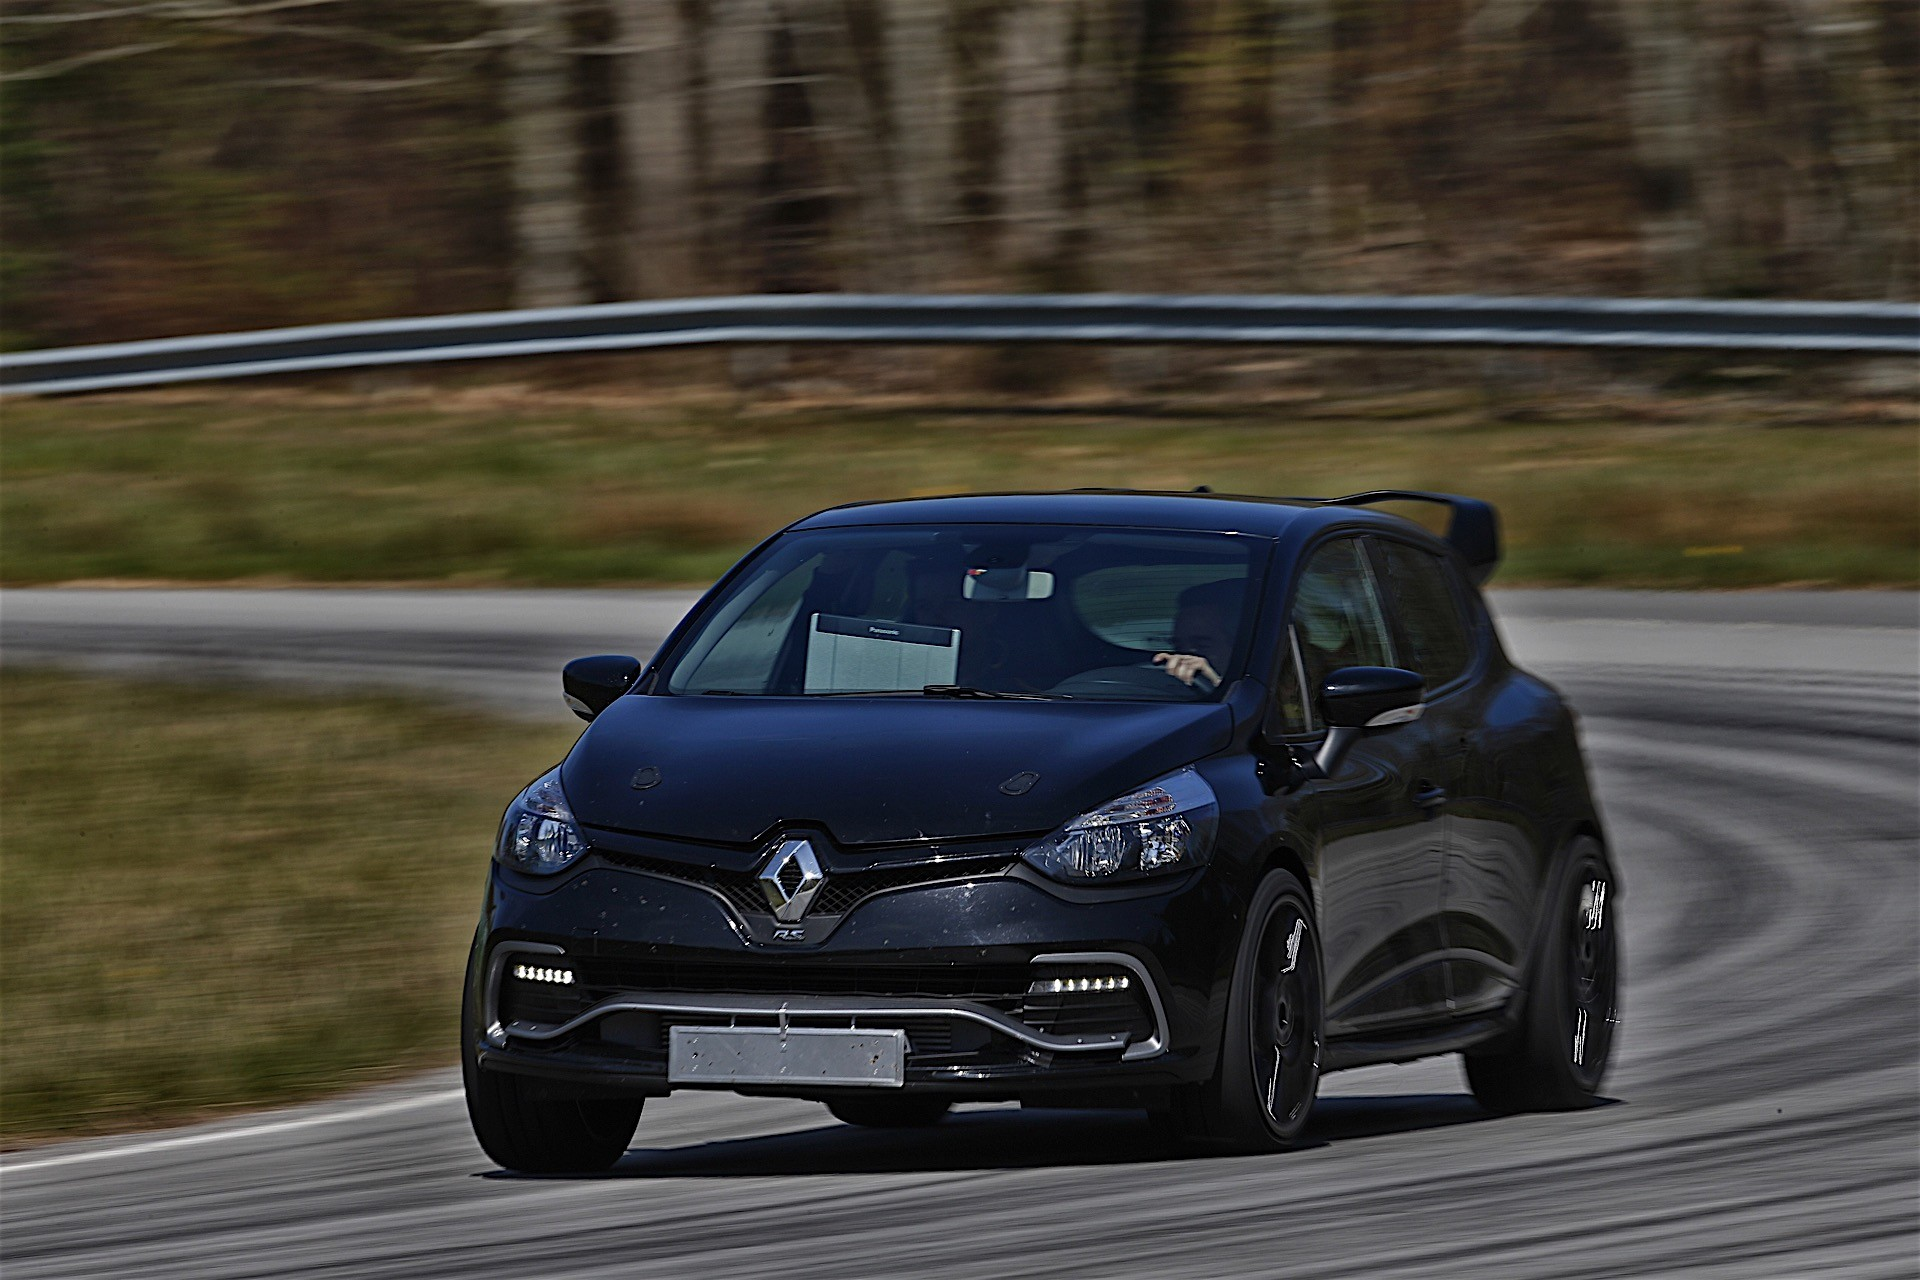 Renault displays clio rs16 concept at 2016 paris motor show autoevolution - Paris motor show ...